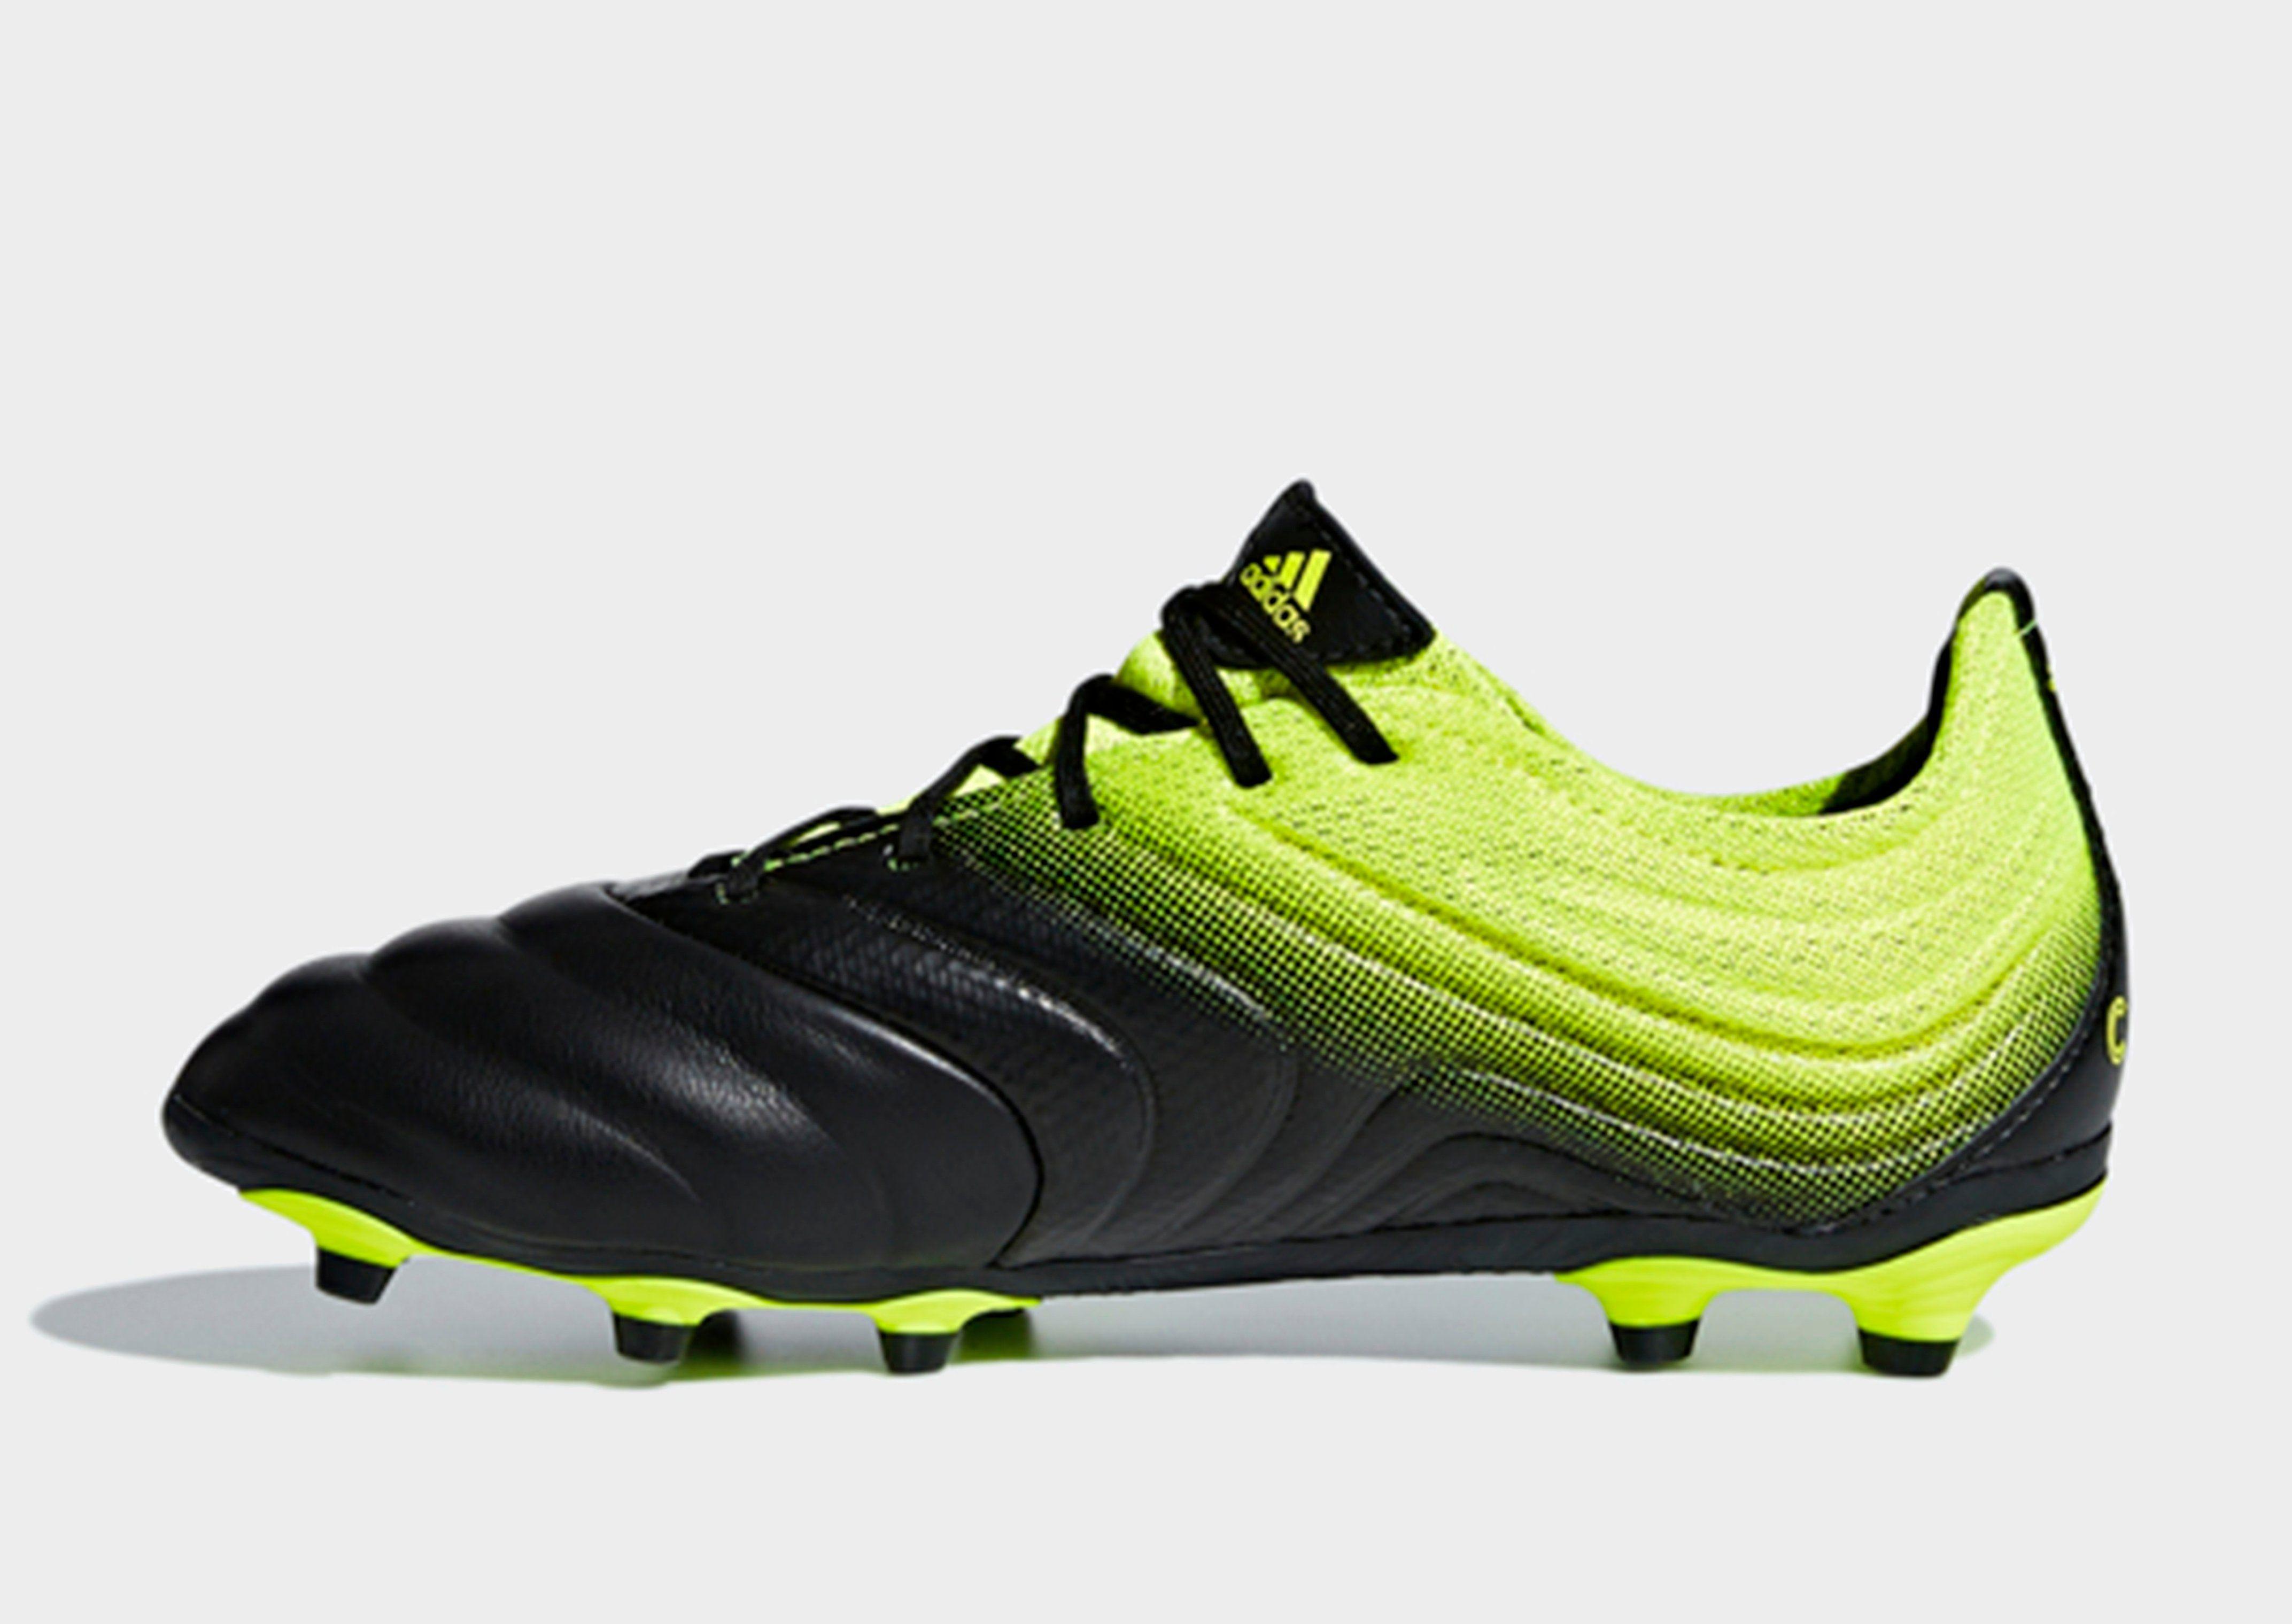 6dad10dbd69 adidas Performance Copa 19.1 Firm Ground Boots | JD Sports